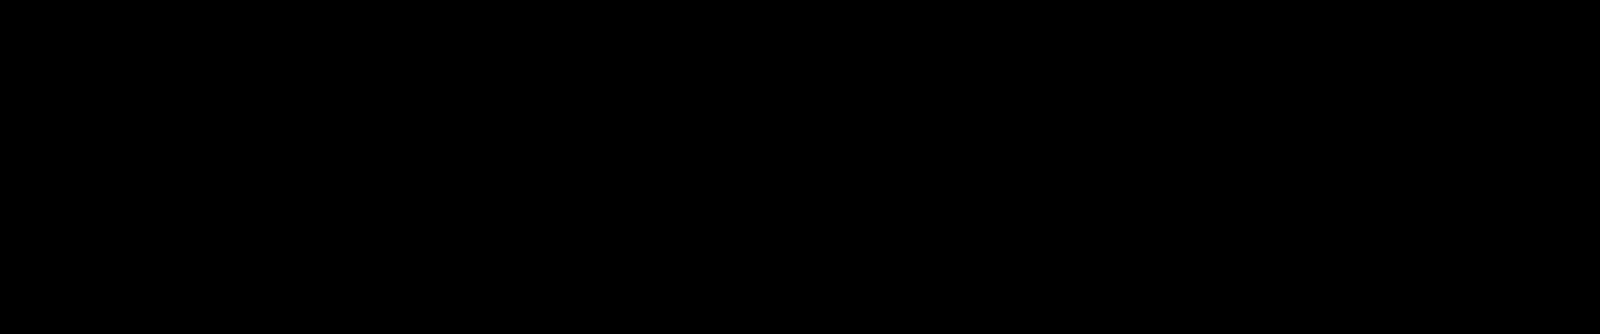 tdk logo 8 - TDK Logo